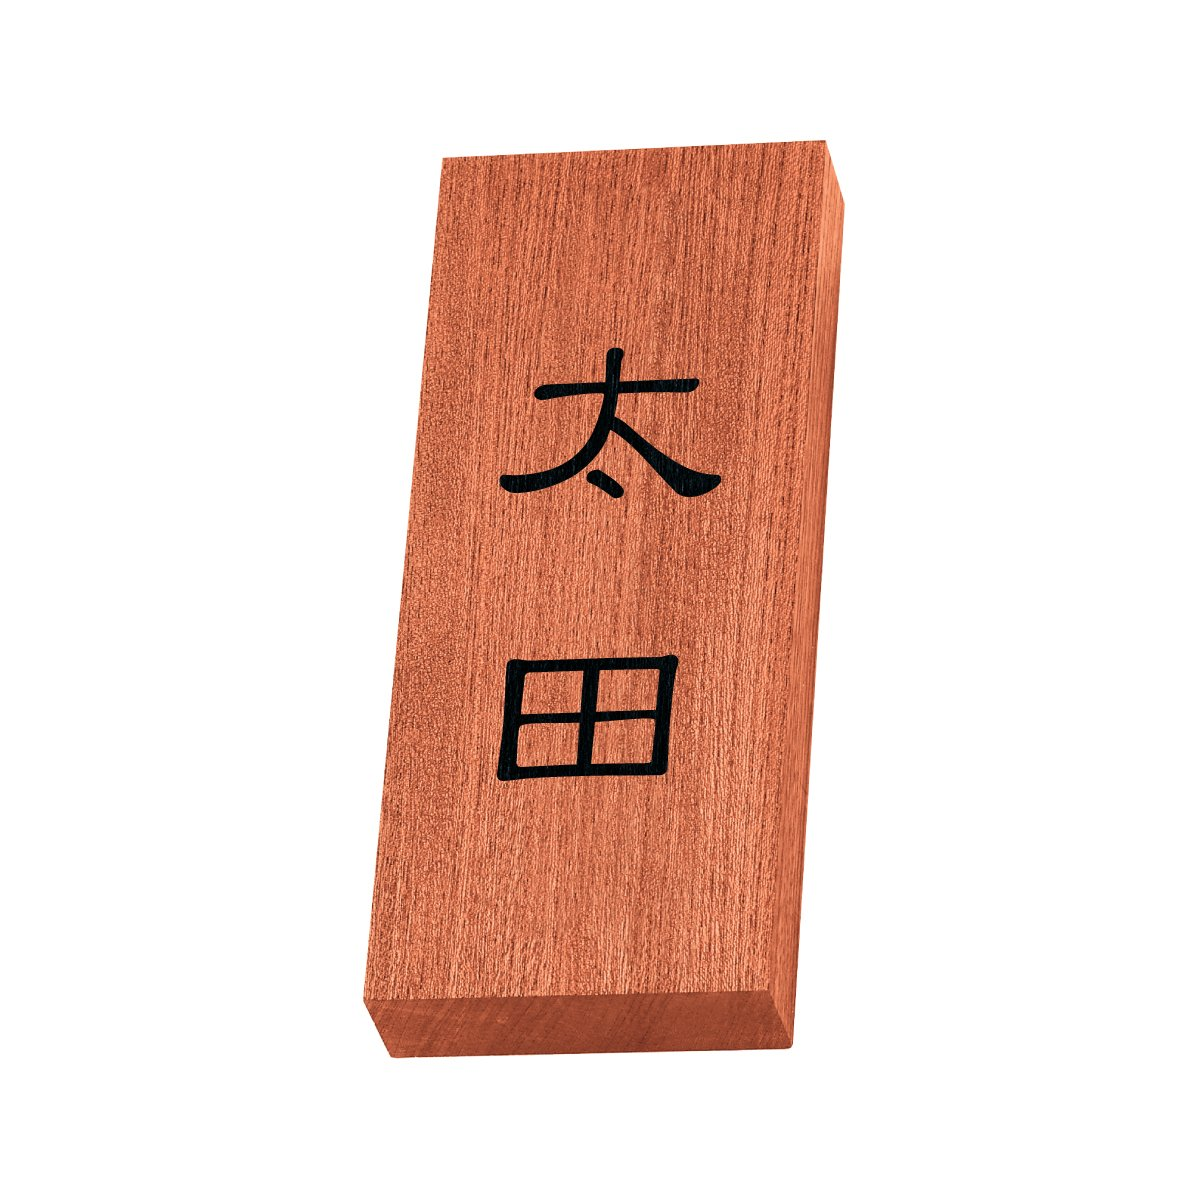 丸三タカギ 彫り込み済表札 【 太田 】 完成品 天然銘木 KH-8-1-太田   B00SM7CZ5Q